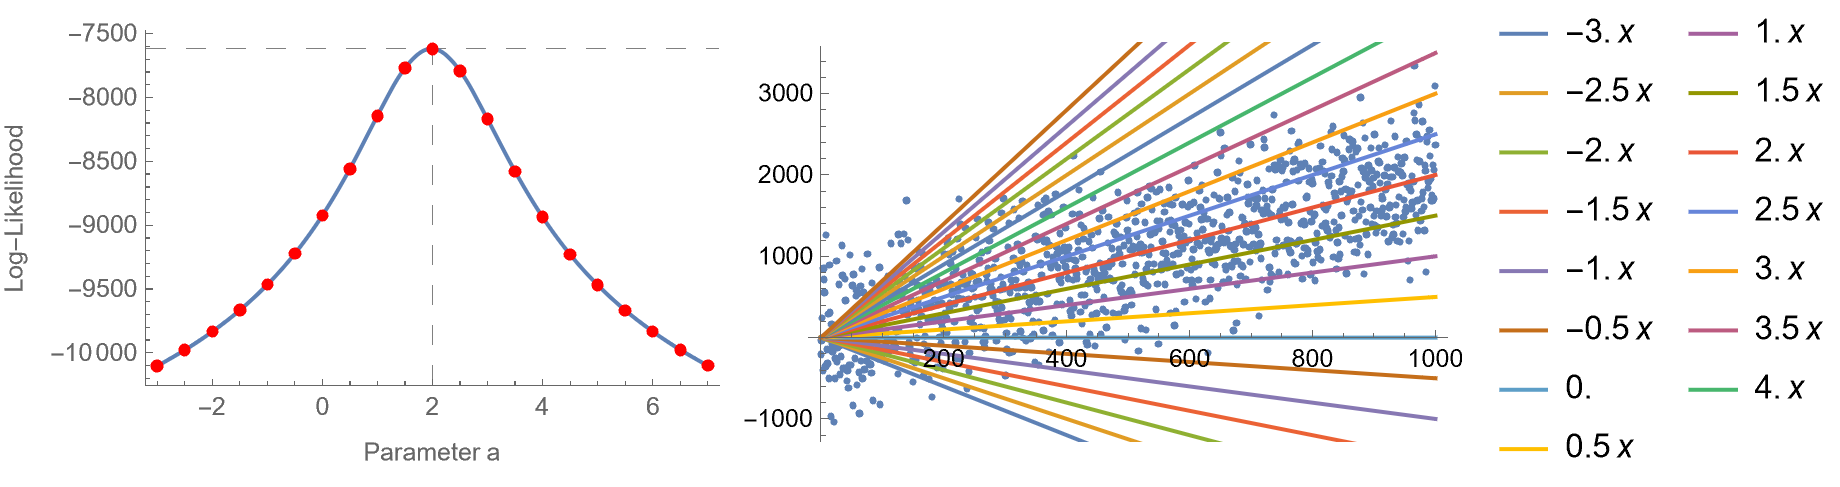 Log likelihood of linear regression model